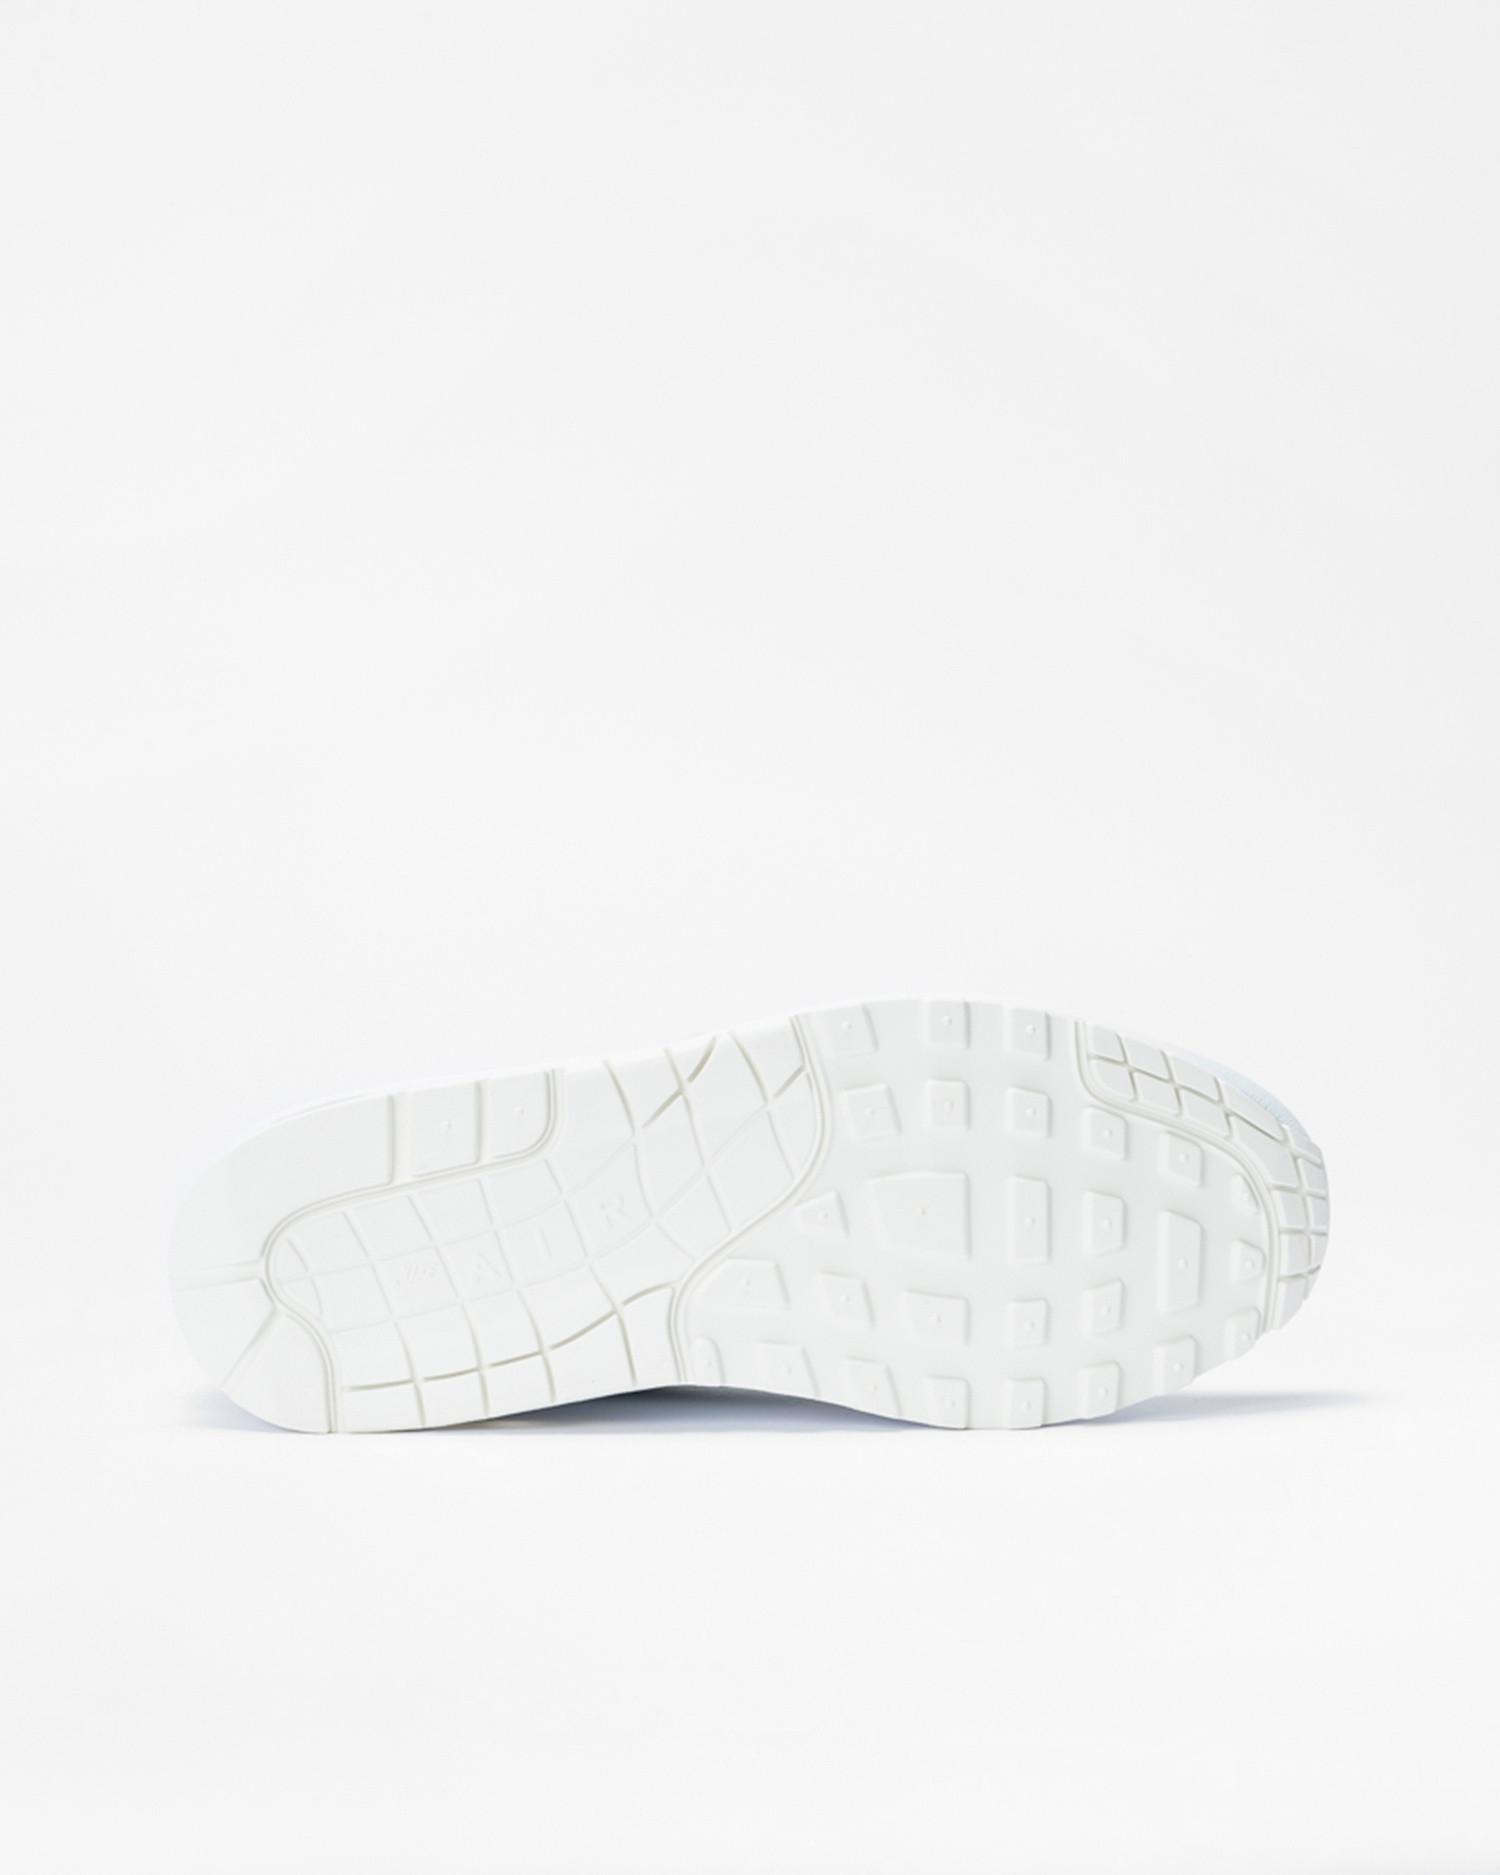 Nike Air Max 1 Asparagus Summit white/white-sail-medium khaki